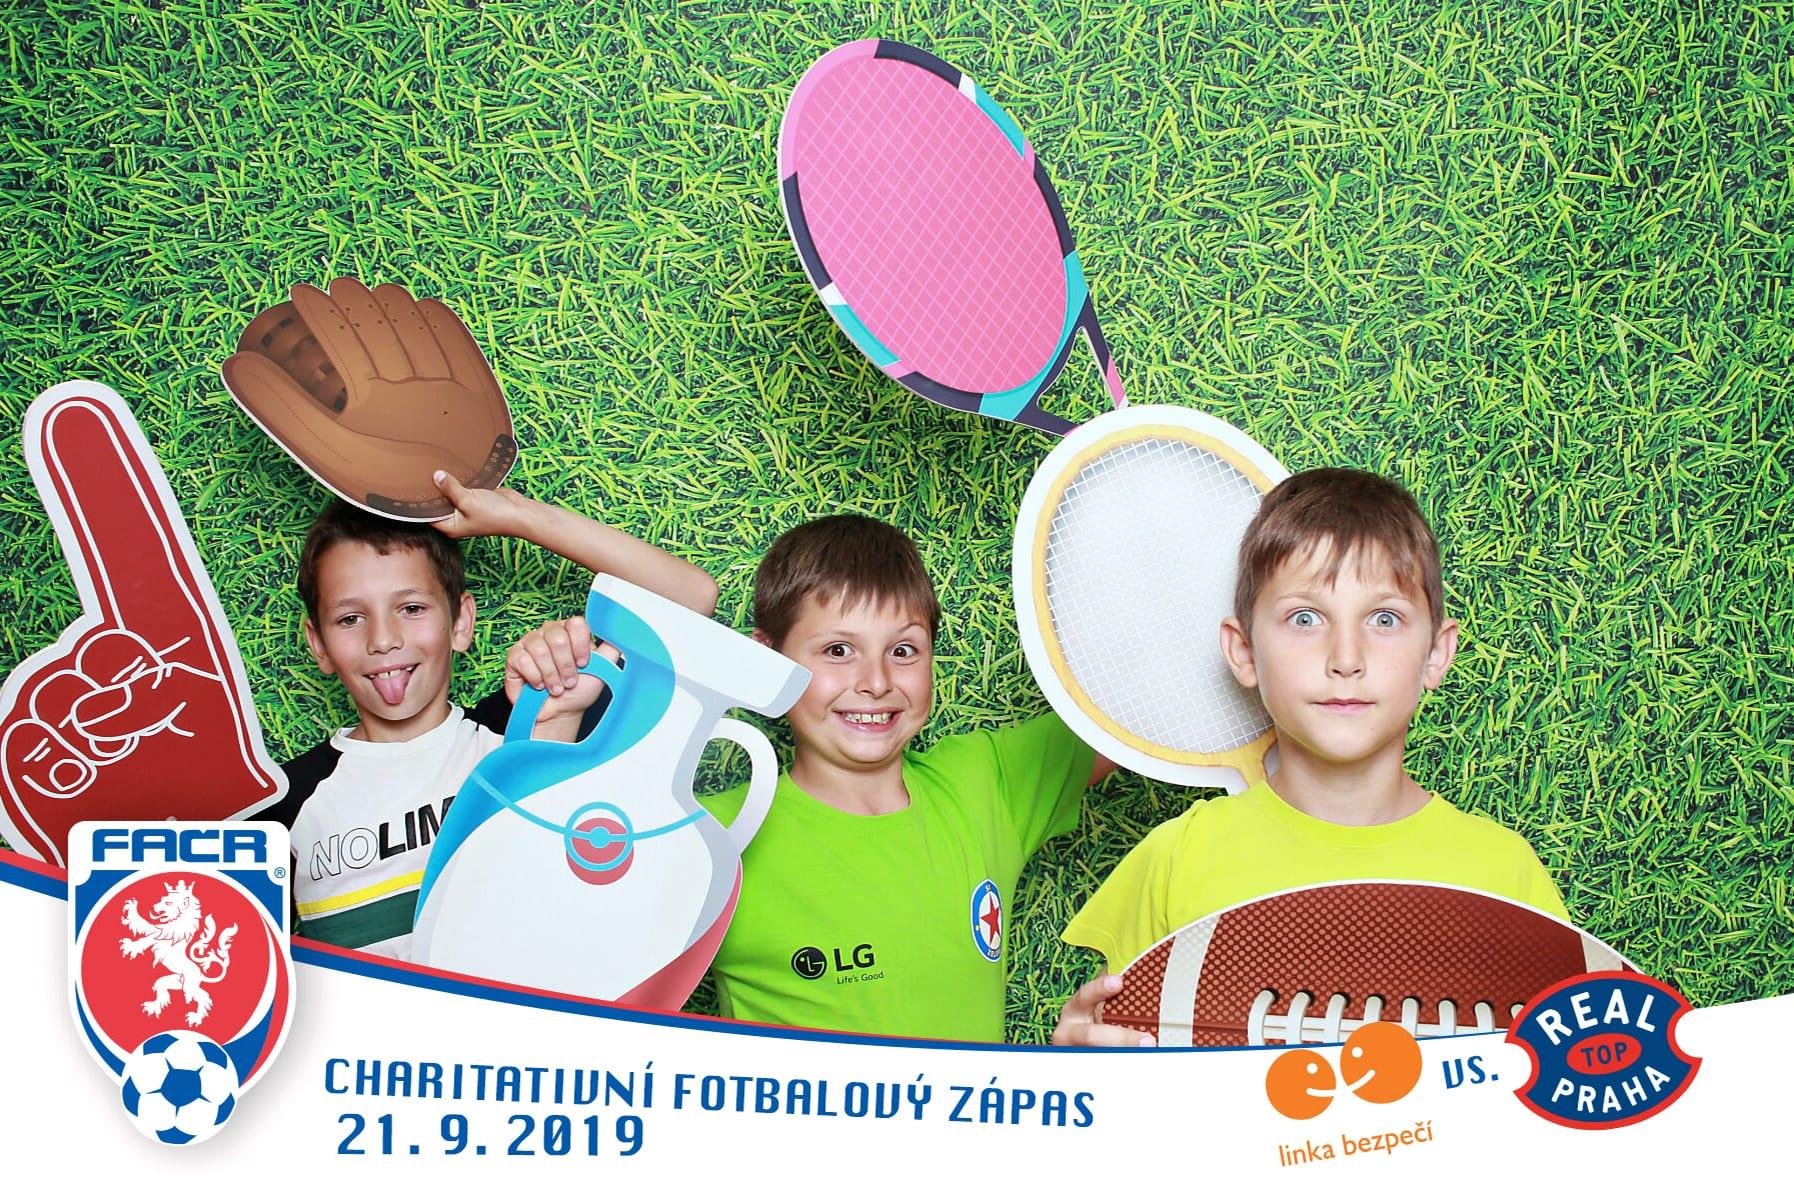 fotokoutek-praha-charitativni-fotbalovy-zapas-linka-bezpeci-vs-real-top-praha-21-9-2019-655645